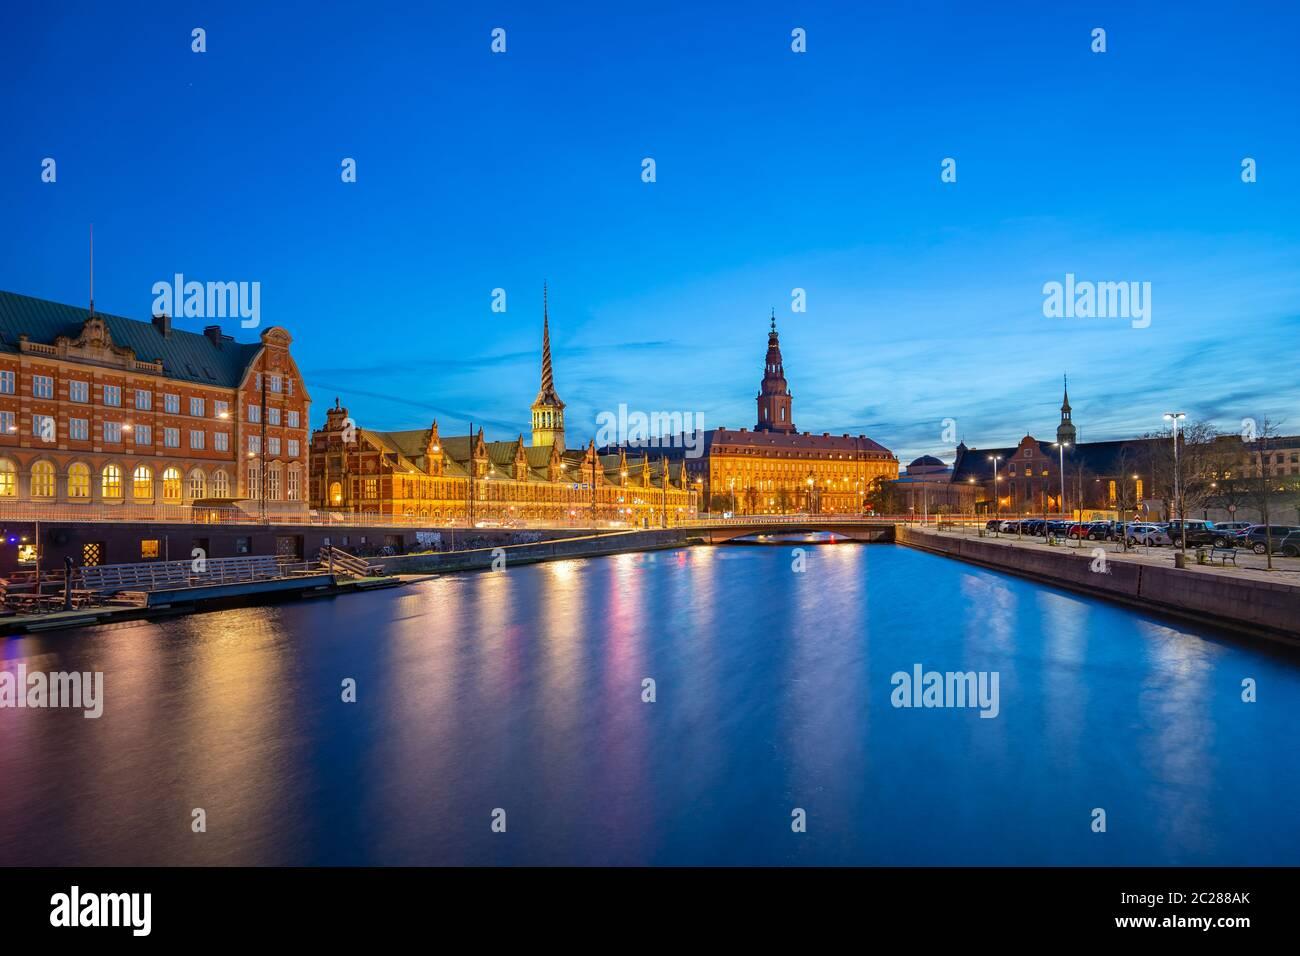 Vista nocturna del Palacio Christiansborg en Copenhague, Dinamarca Foto de stock